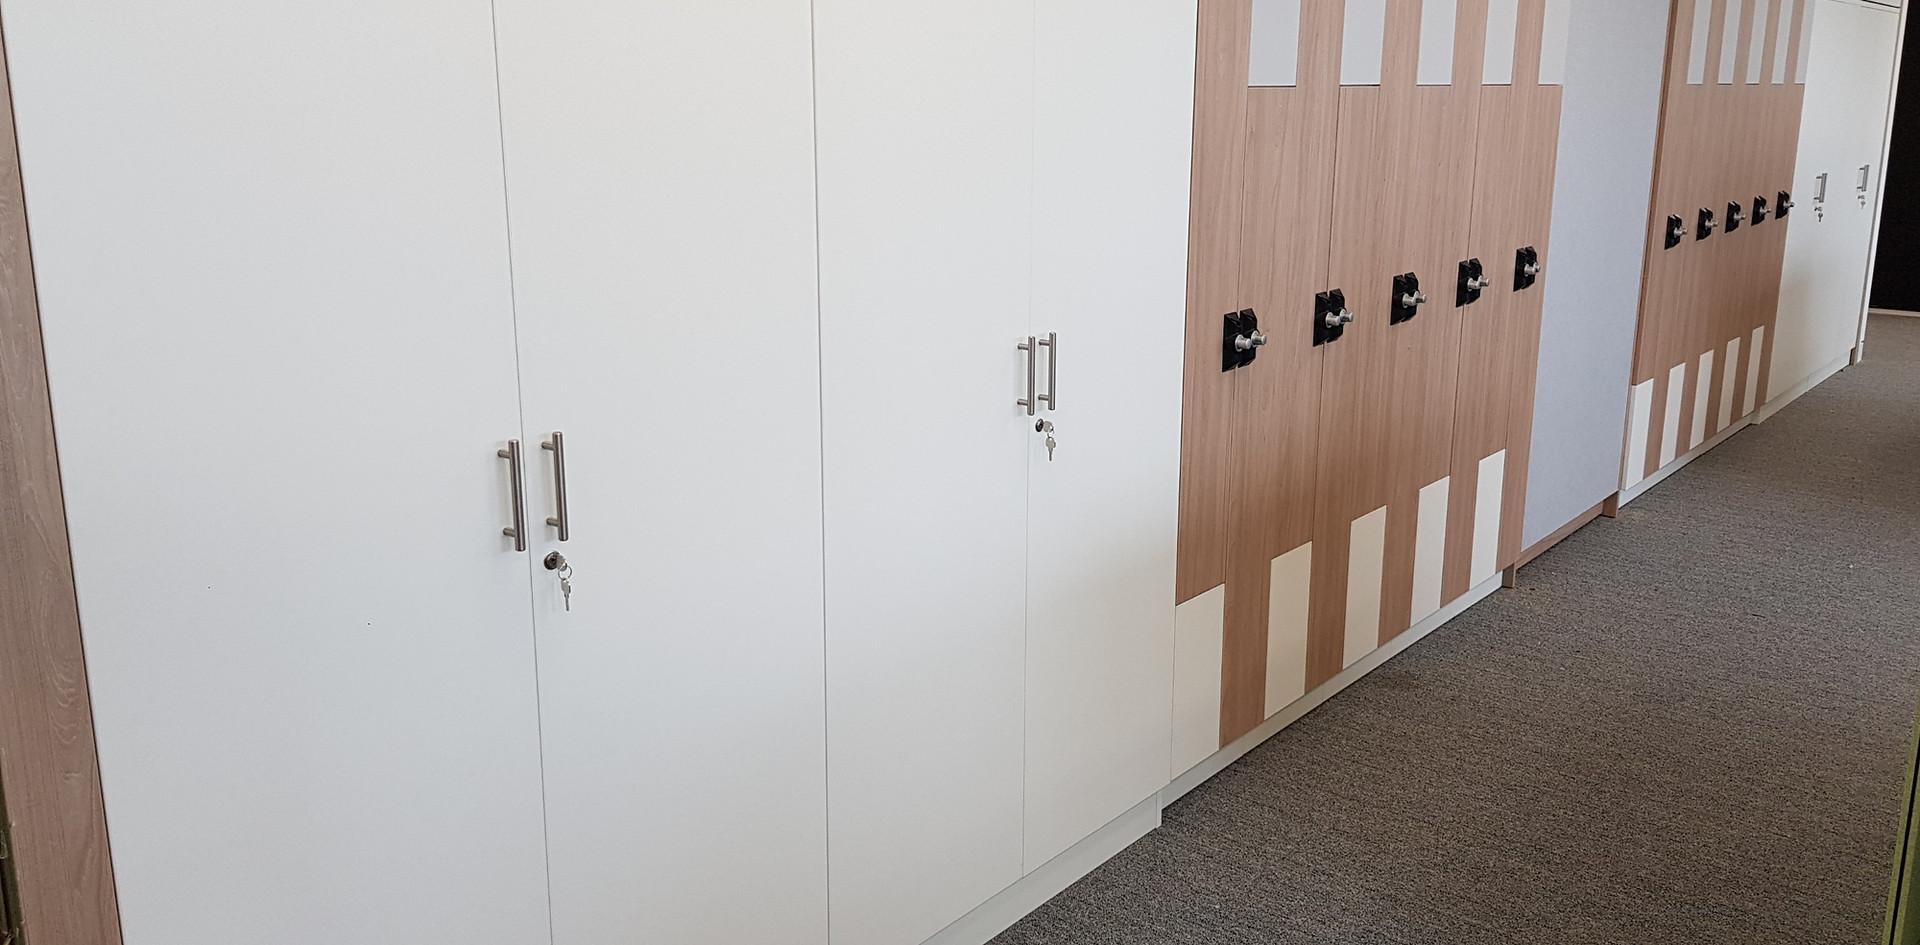 workplace agile flexible working lockers storagewall RFID locks